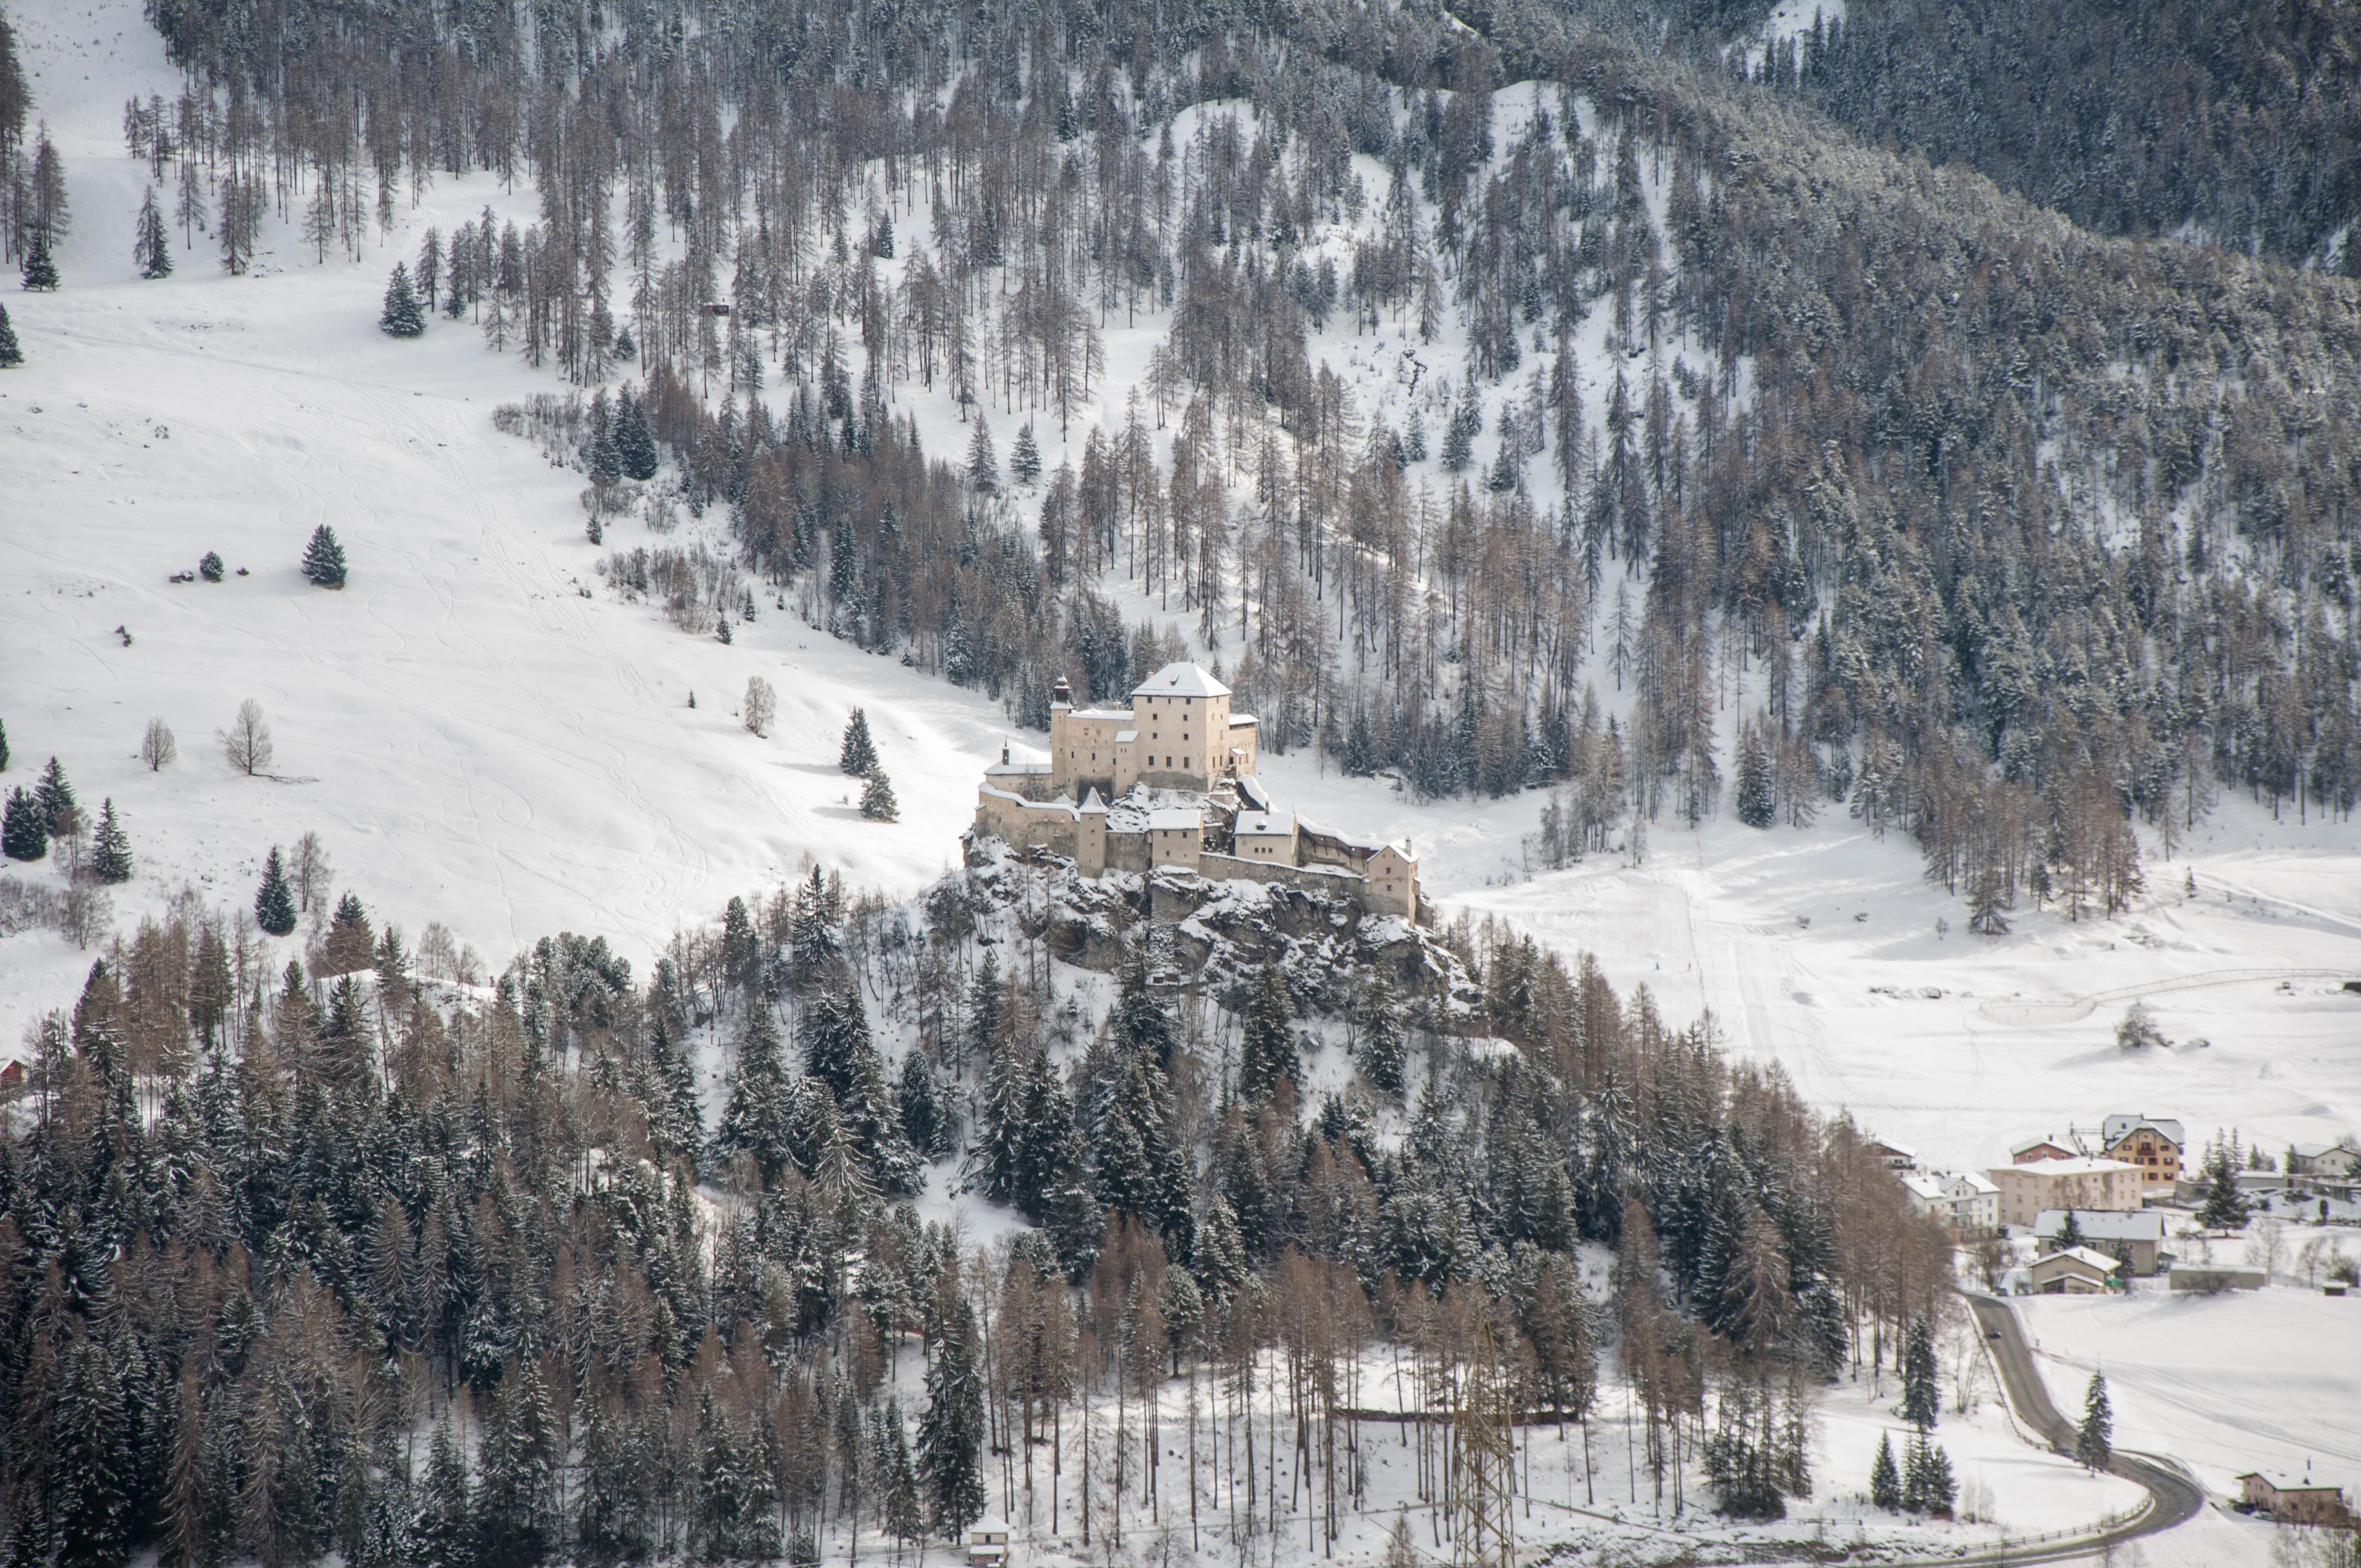 Vulpera Switzerland  city images : ... 02 25 14 01 50 1640.0 Switzerland Kanton Graubünden Vulpera Fetan